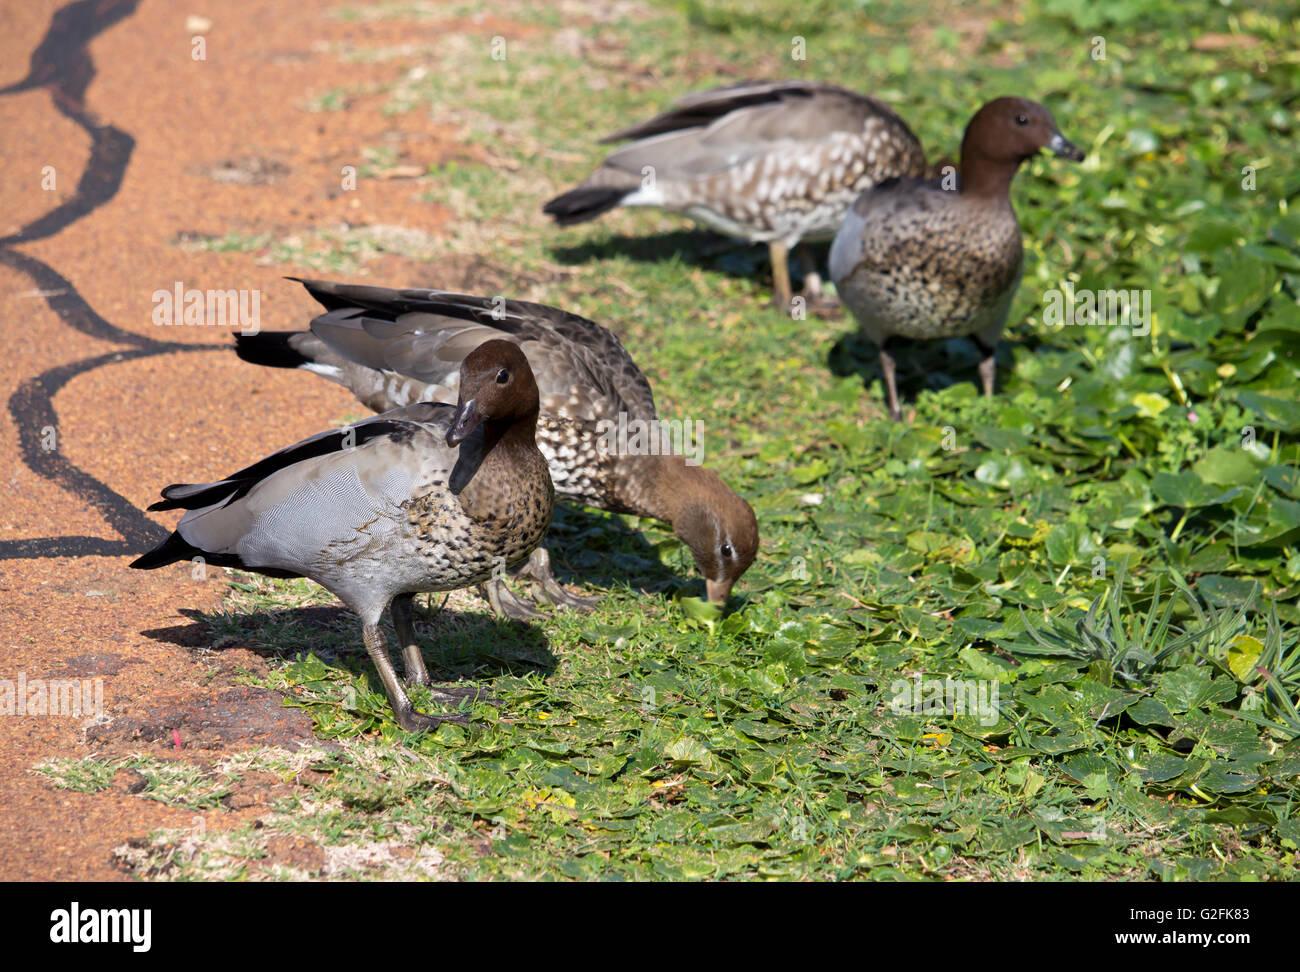 Australian wood ducks   chenonetta jubata   eating grass in a green field  near a cycleway in Big Swamp, Bunbury, - Stock Image